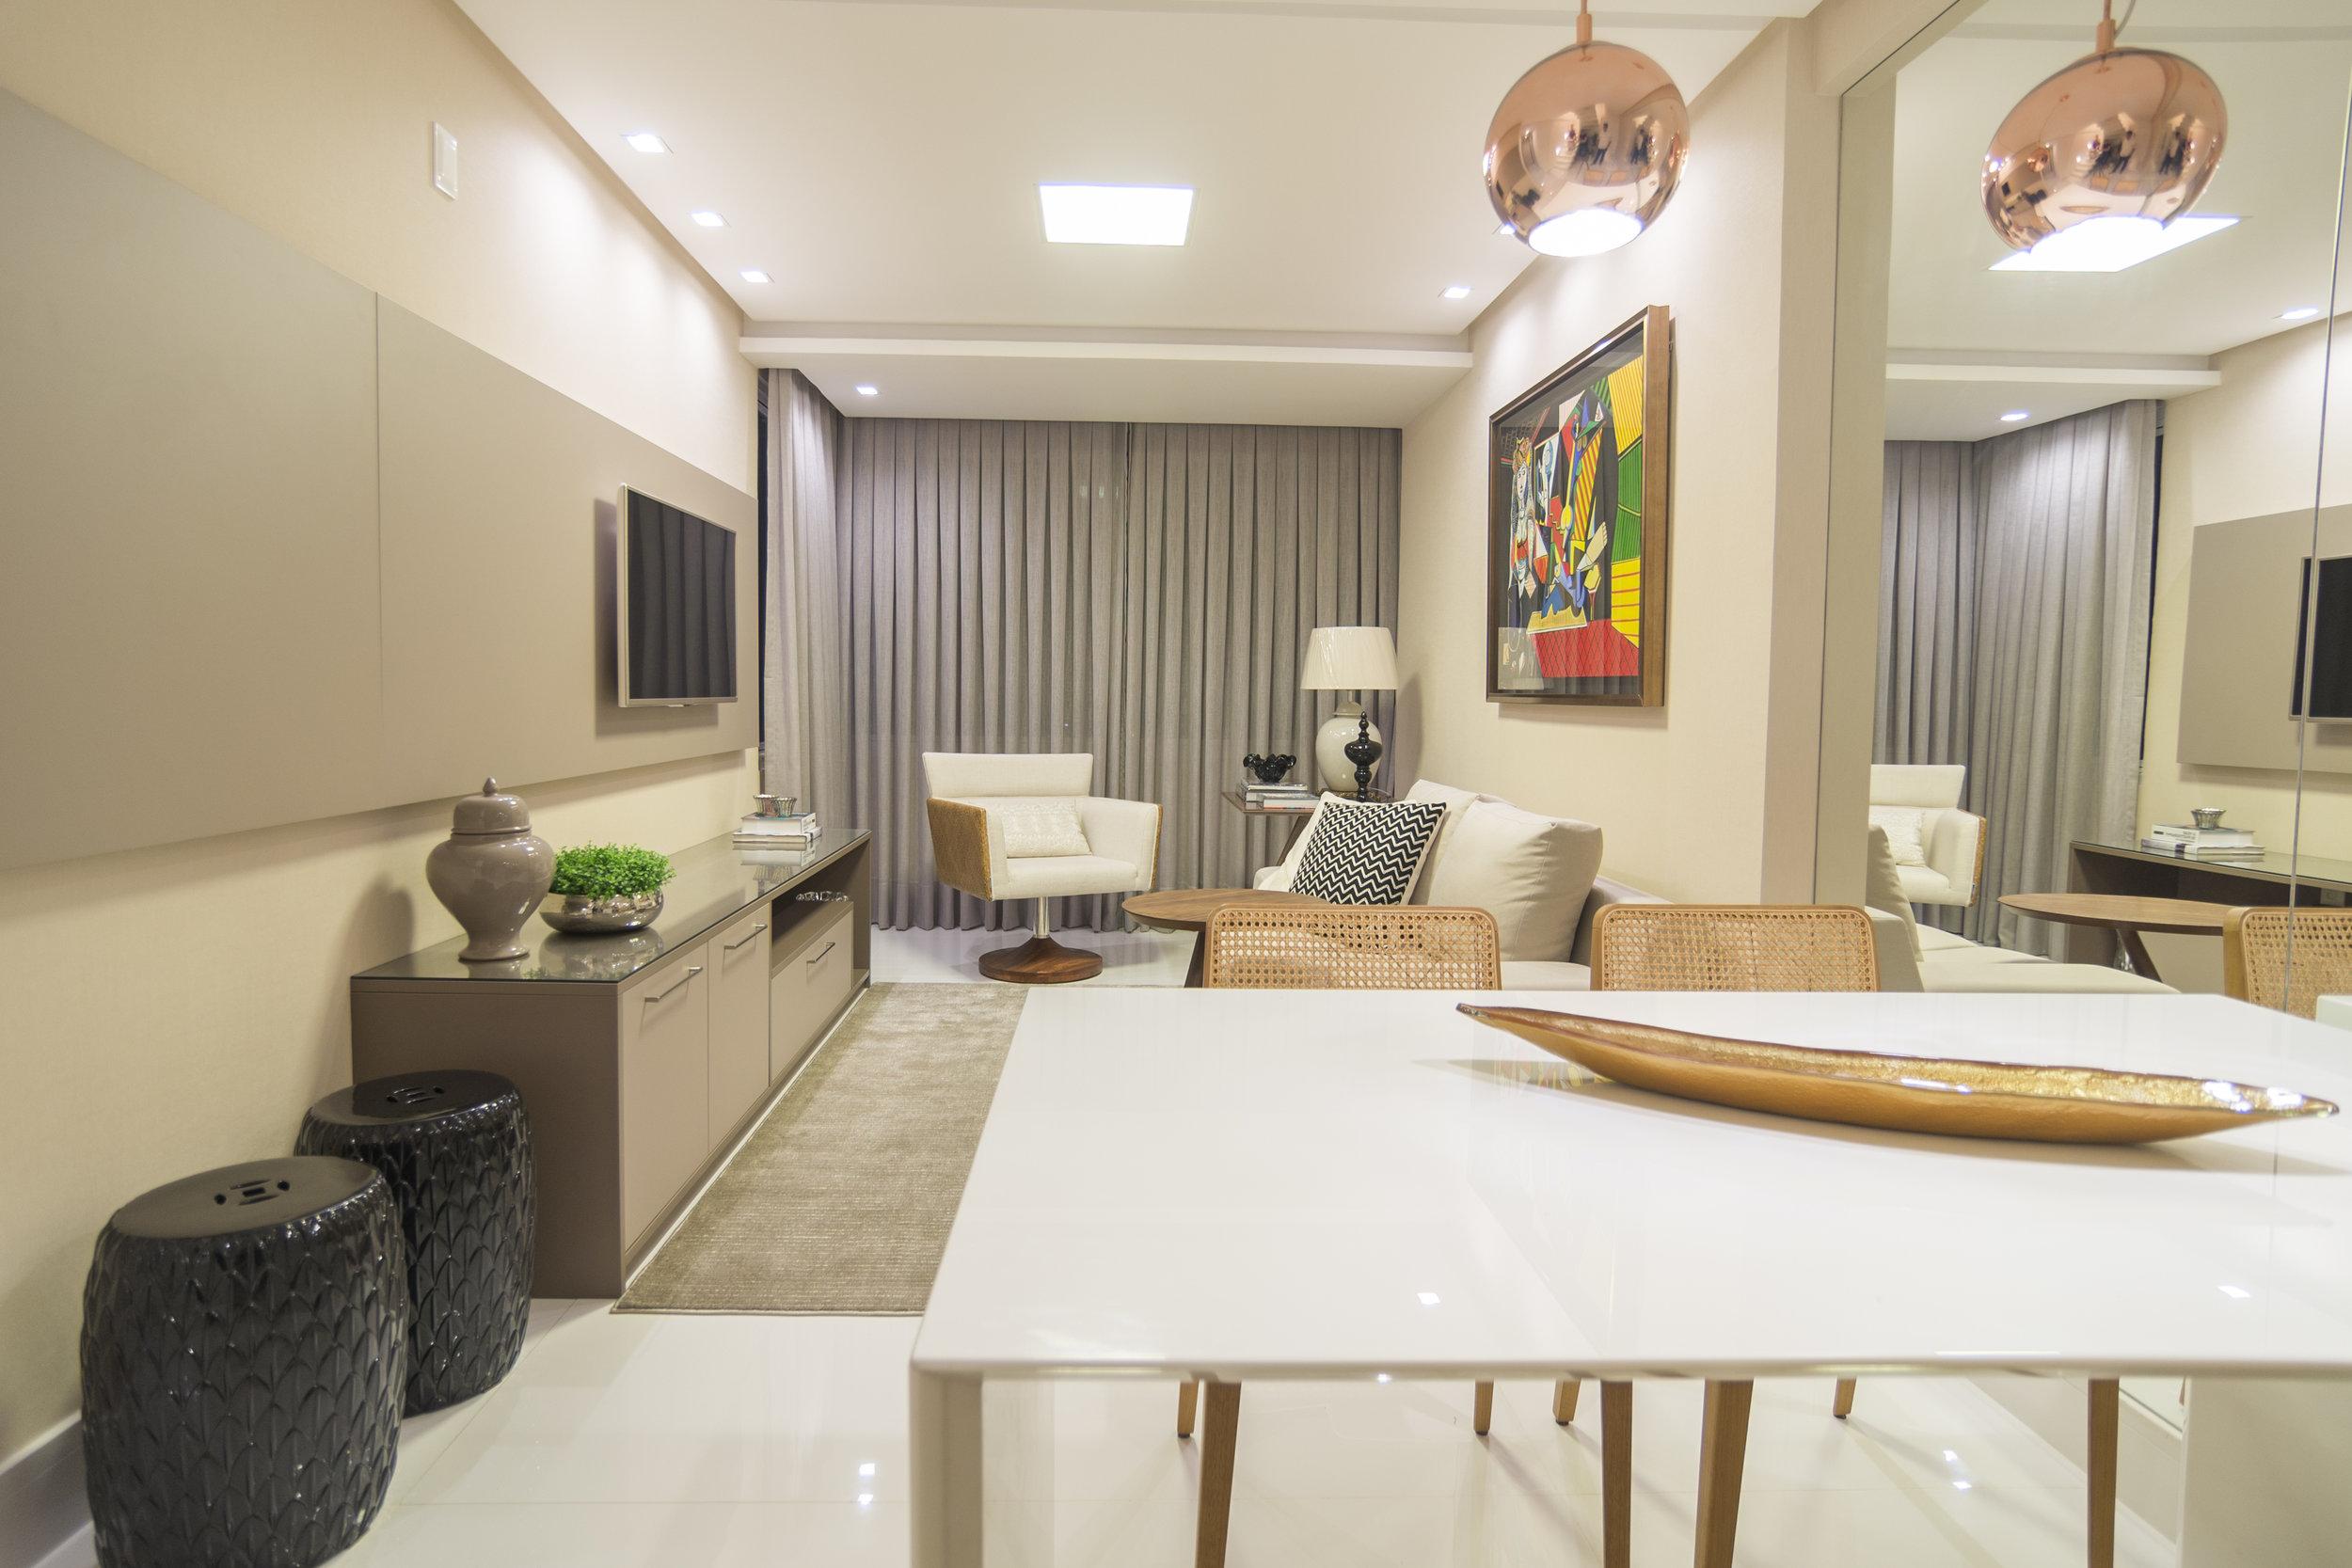 projeto-arquitetonico-robertoindira-duo-arquitetura-apartamentos-estar-02.jpg